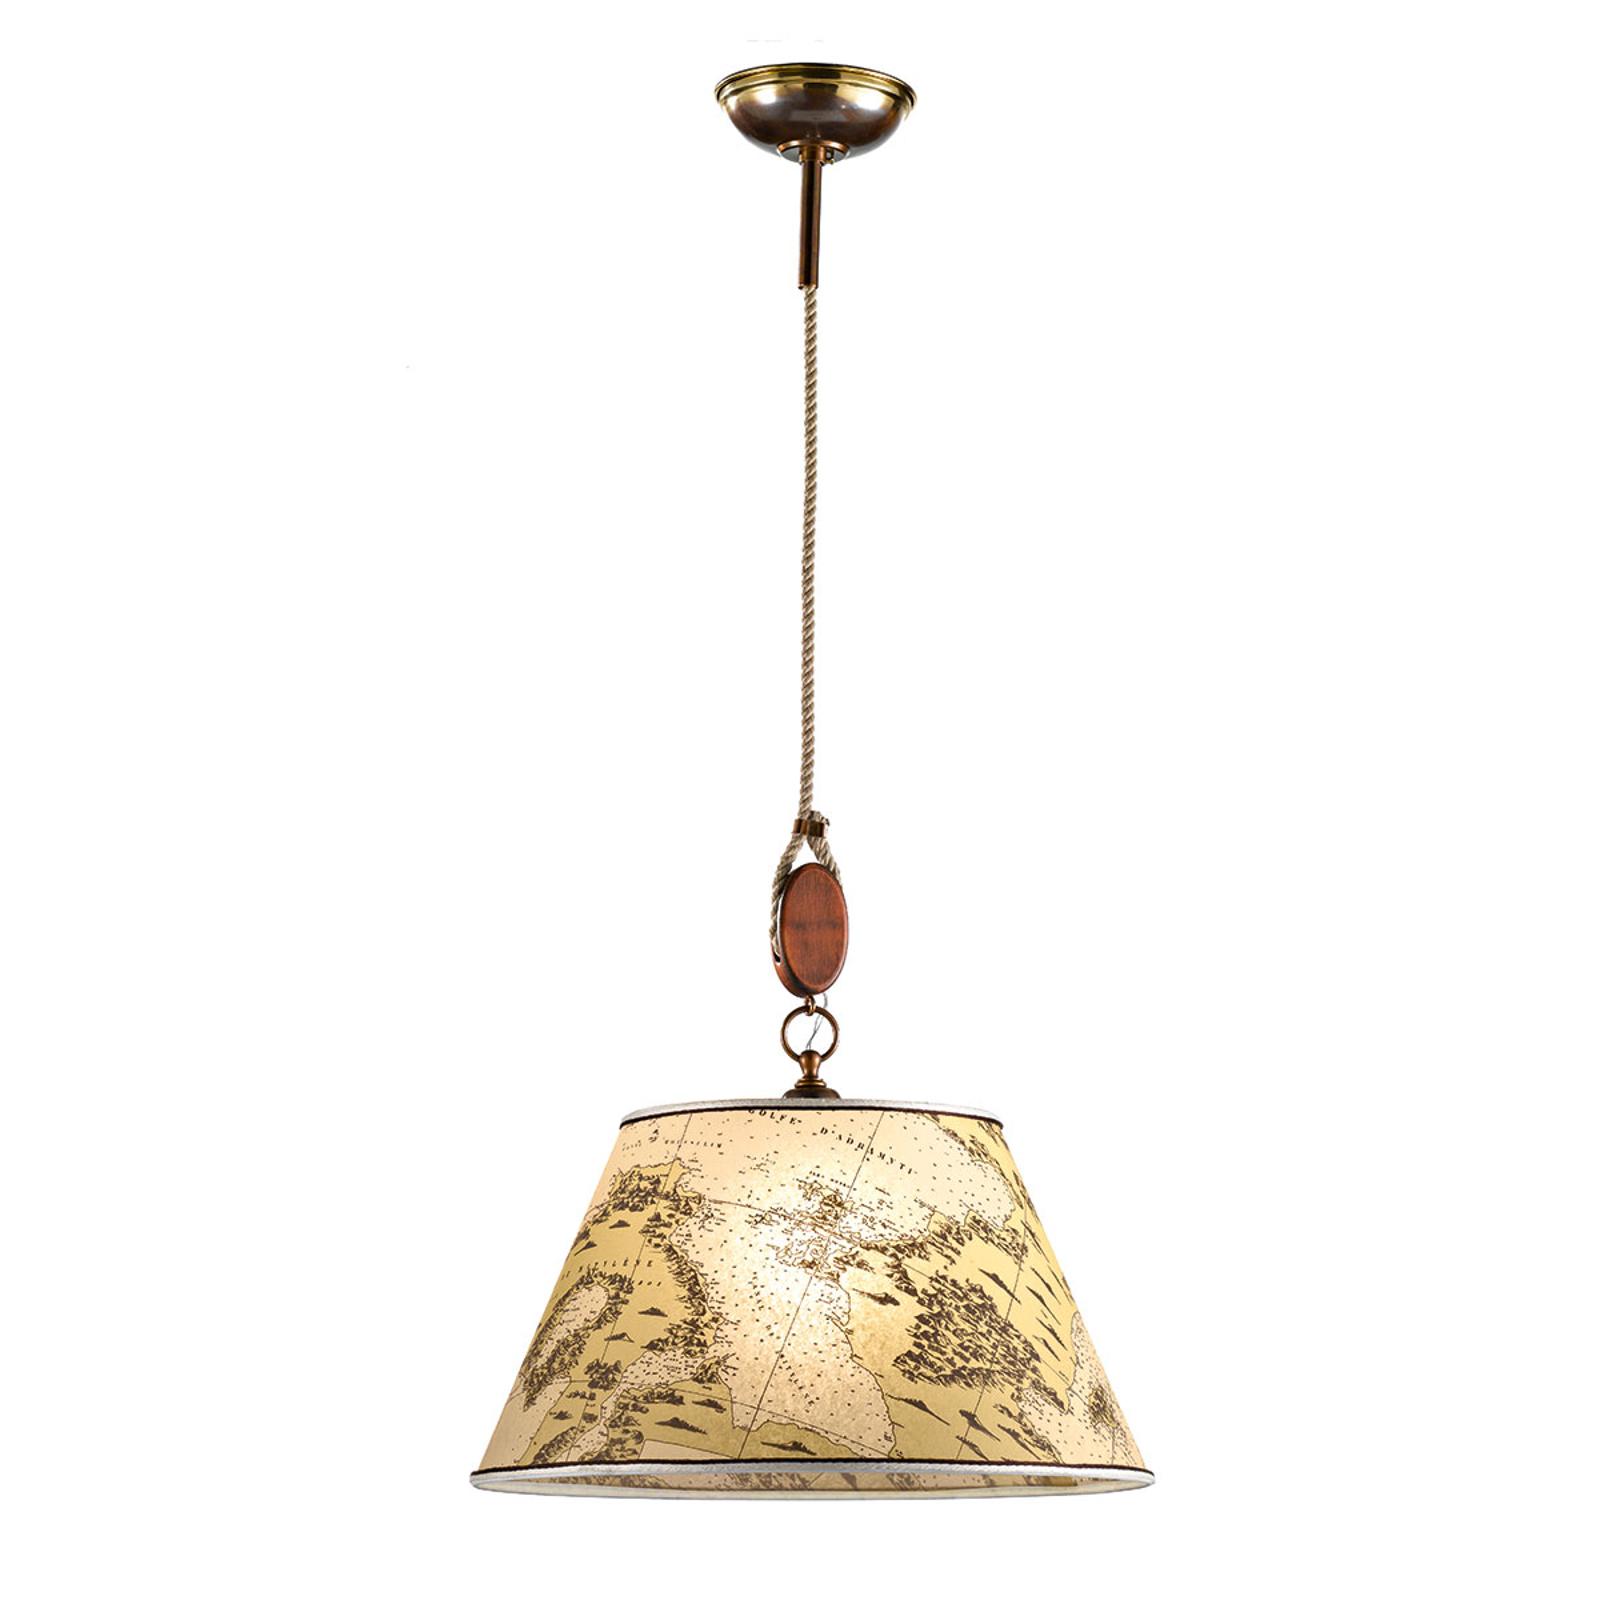 Klassisk Nautica pendellampe på 40 cm